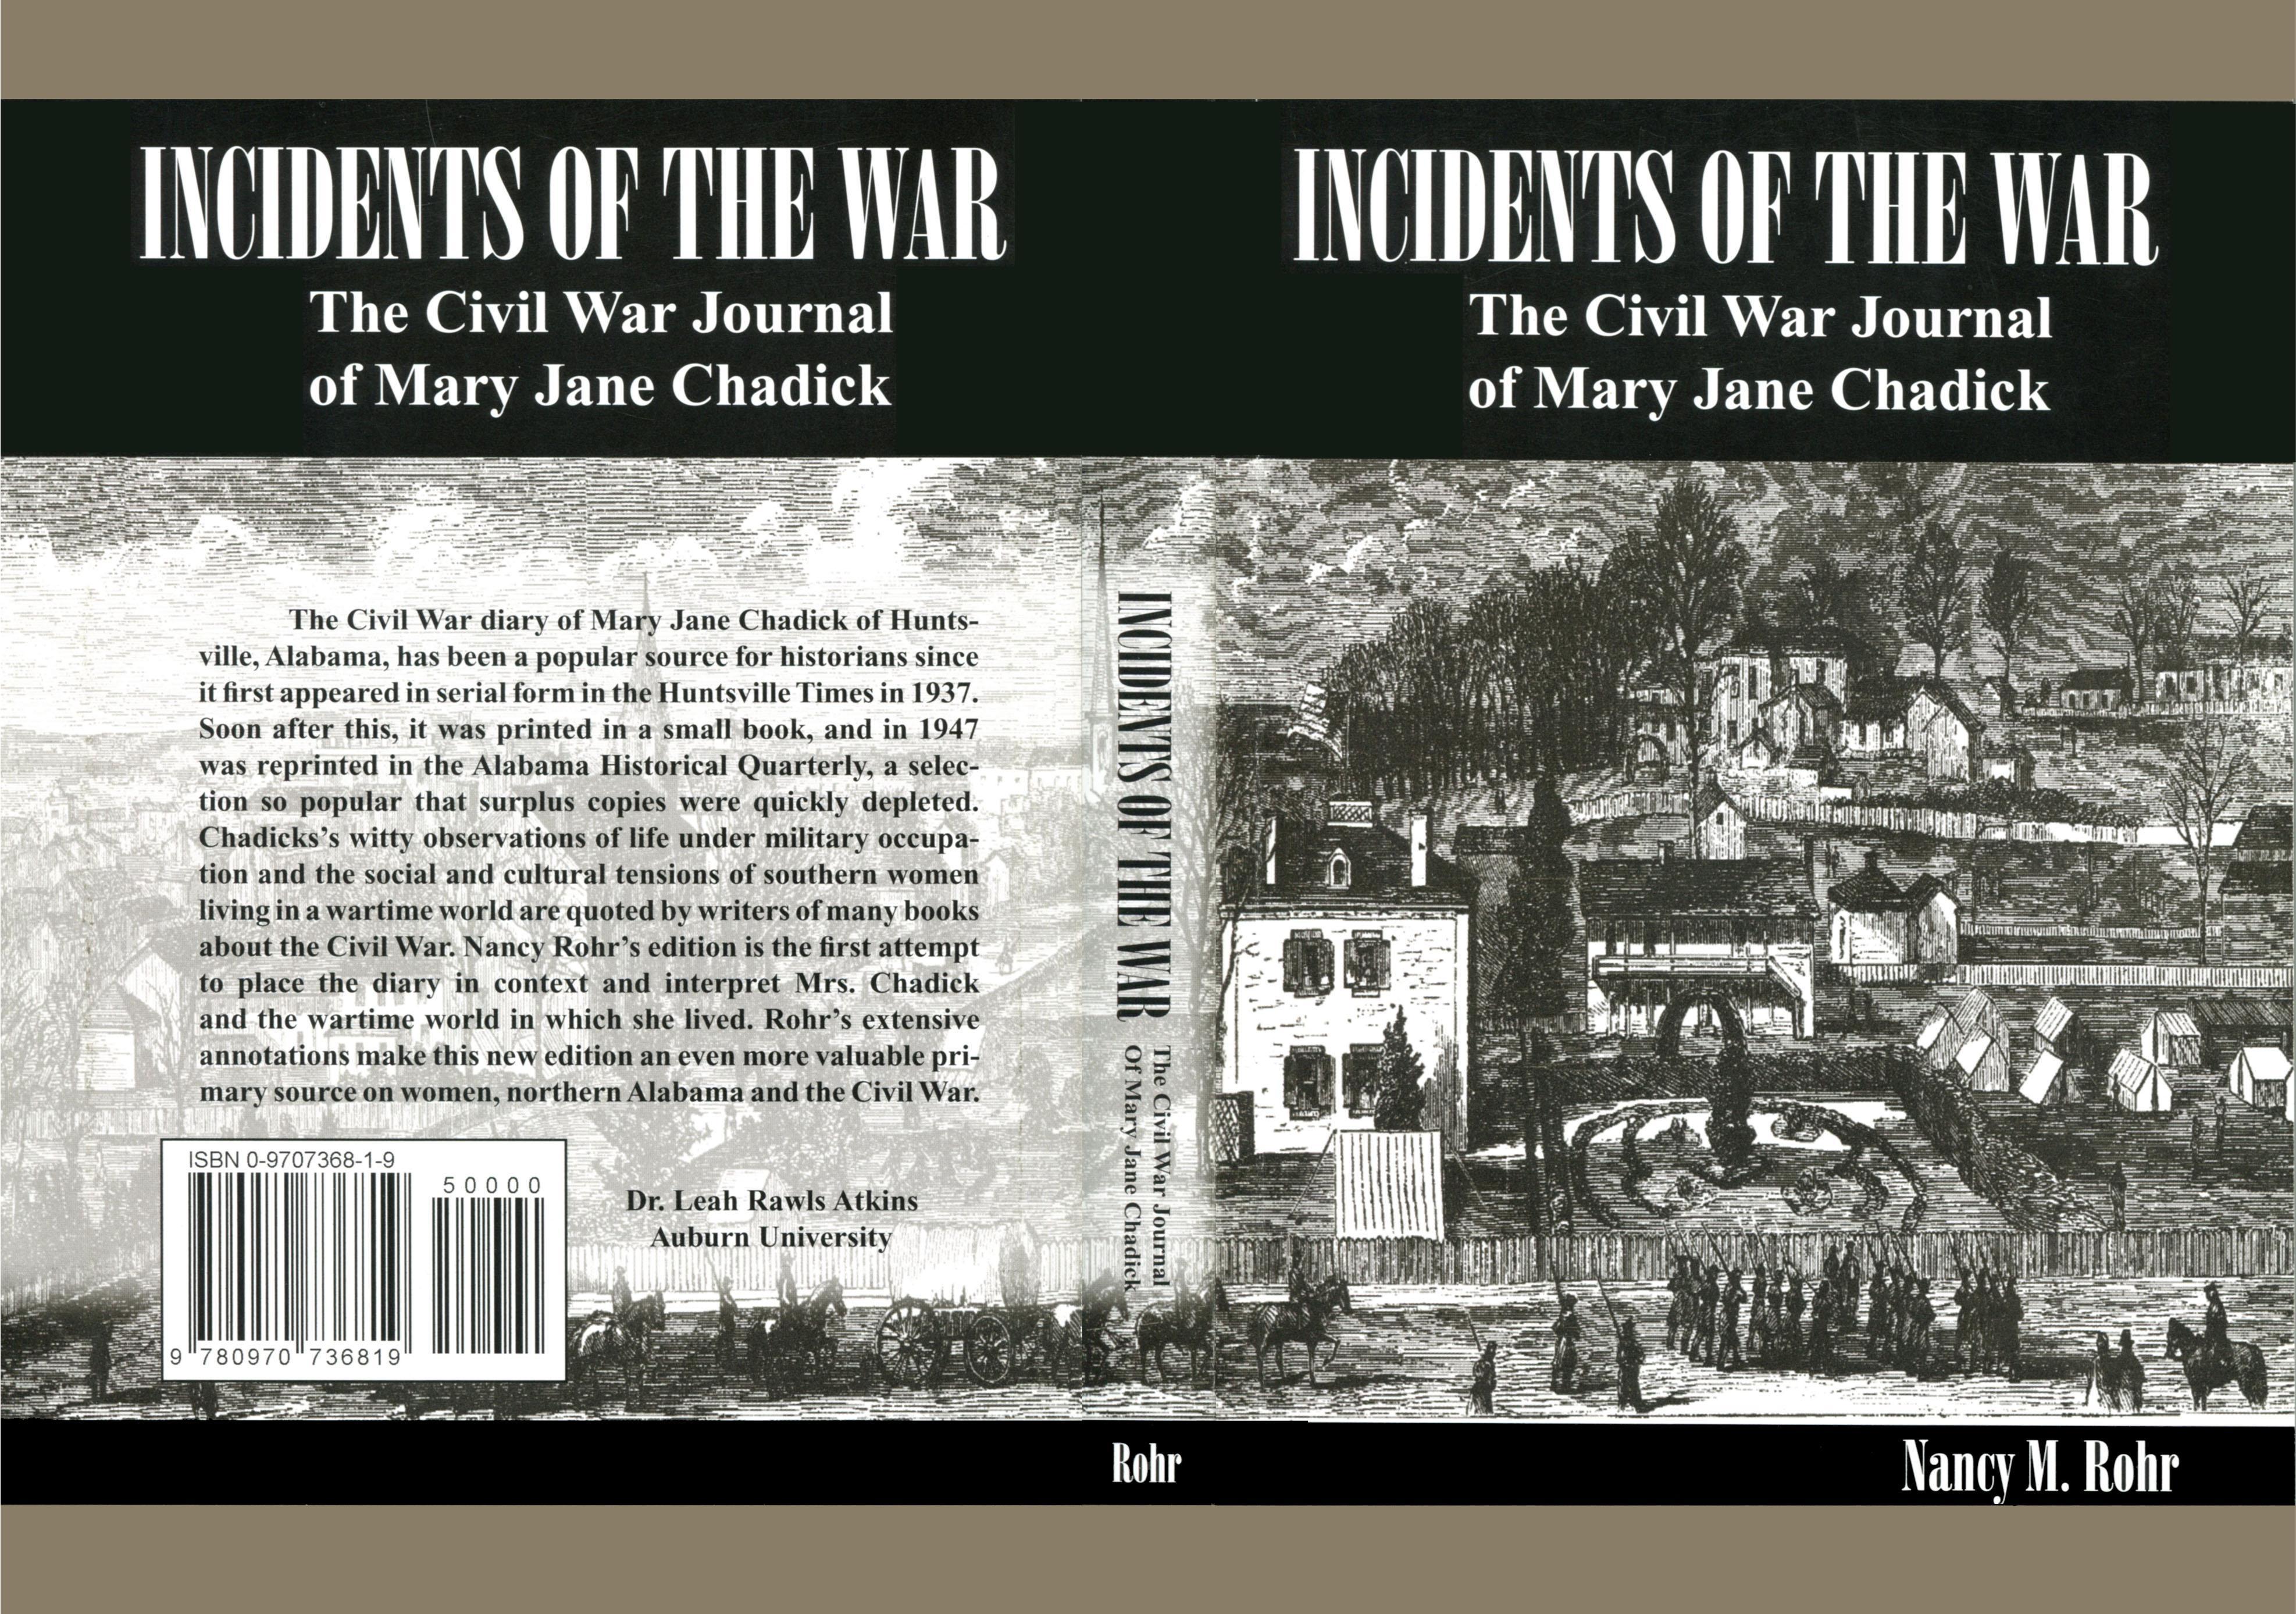 civil war bibliography annotated Art: citation & annotated bibs  writing an annotated bibliography  at antibes:  autobiography, apocalypse, and the spanish civil war.